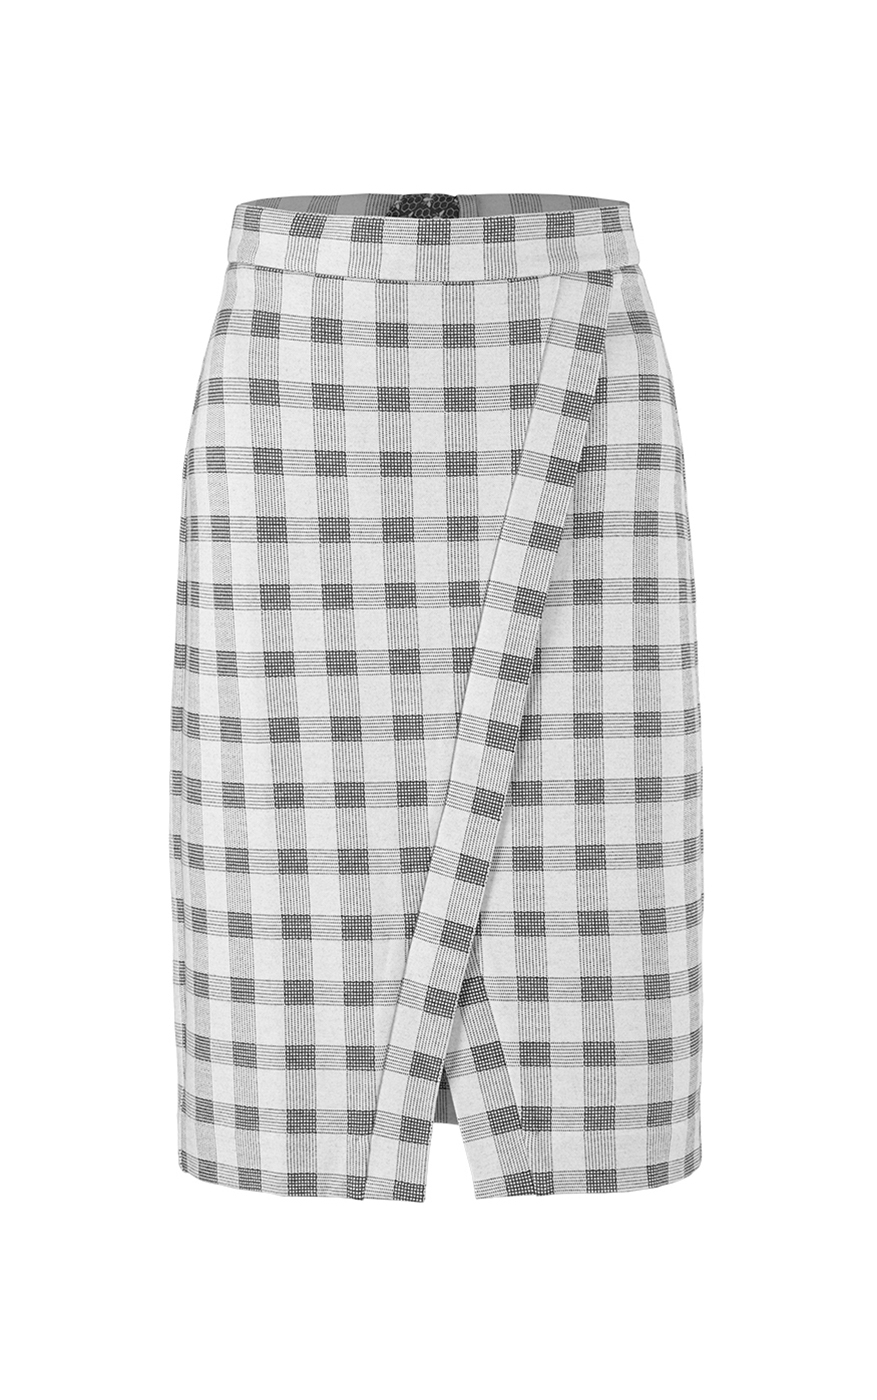 cabi's Valentina Skirt